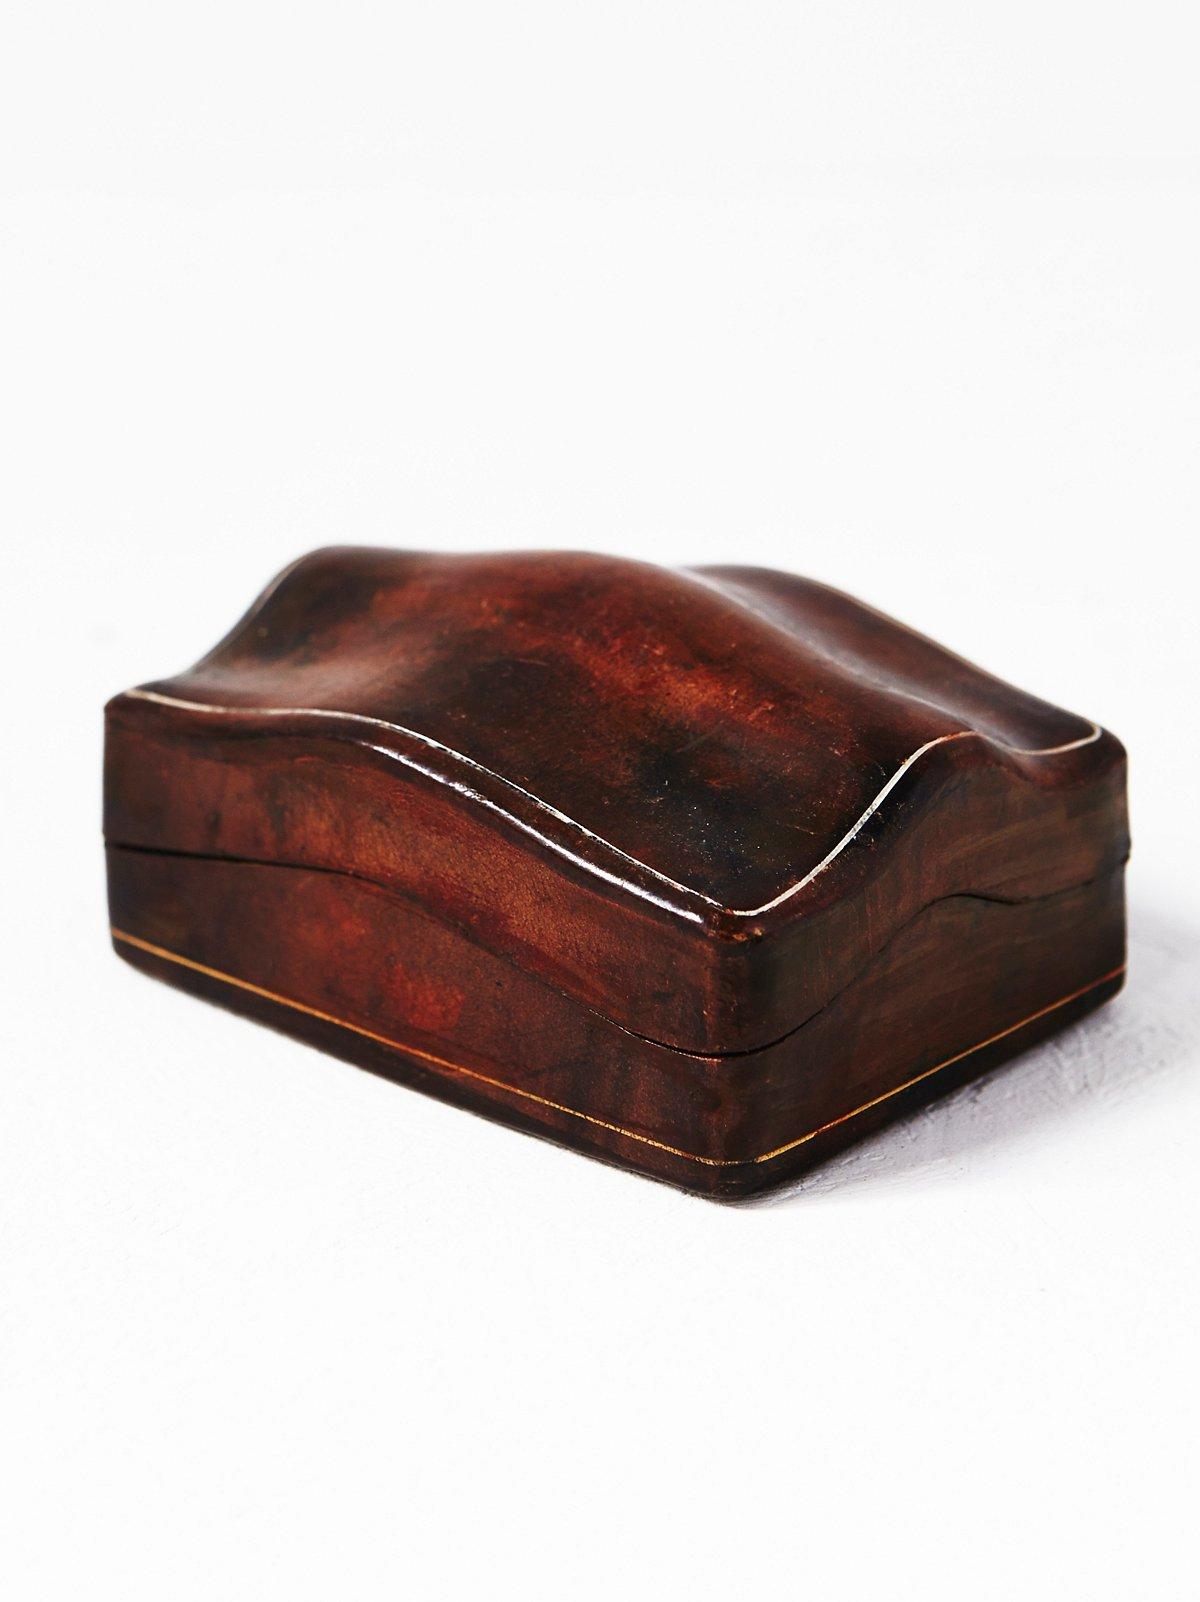 Vintage Leather Cuff Links Box